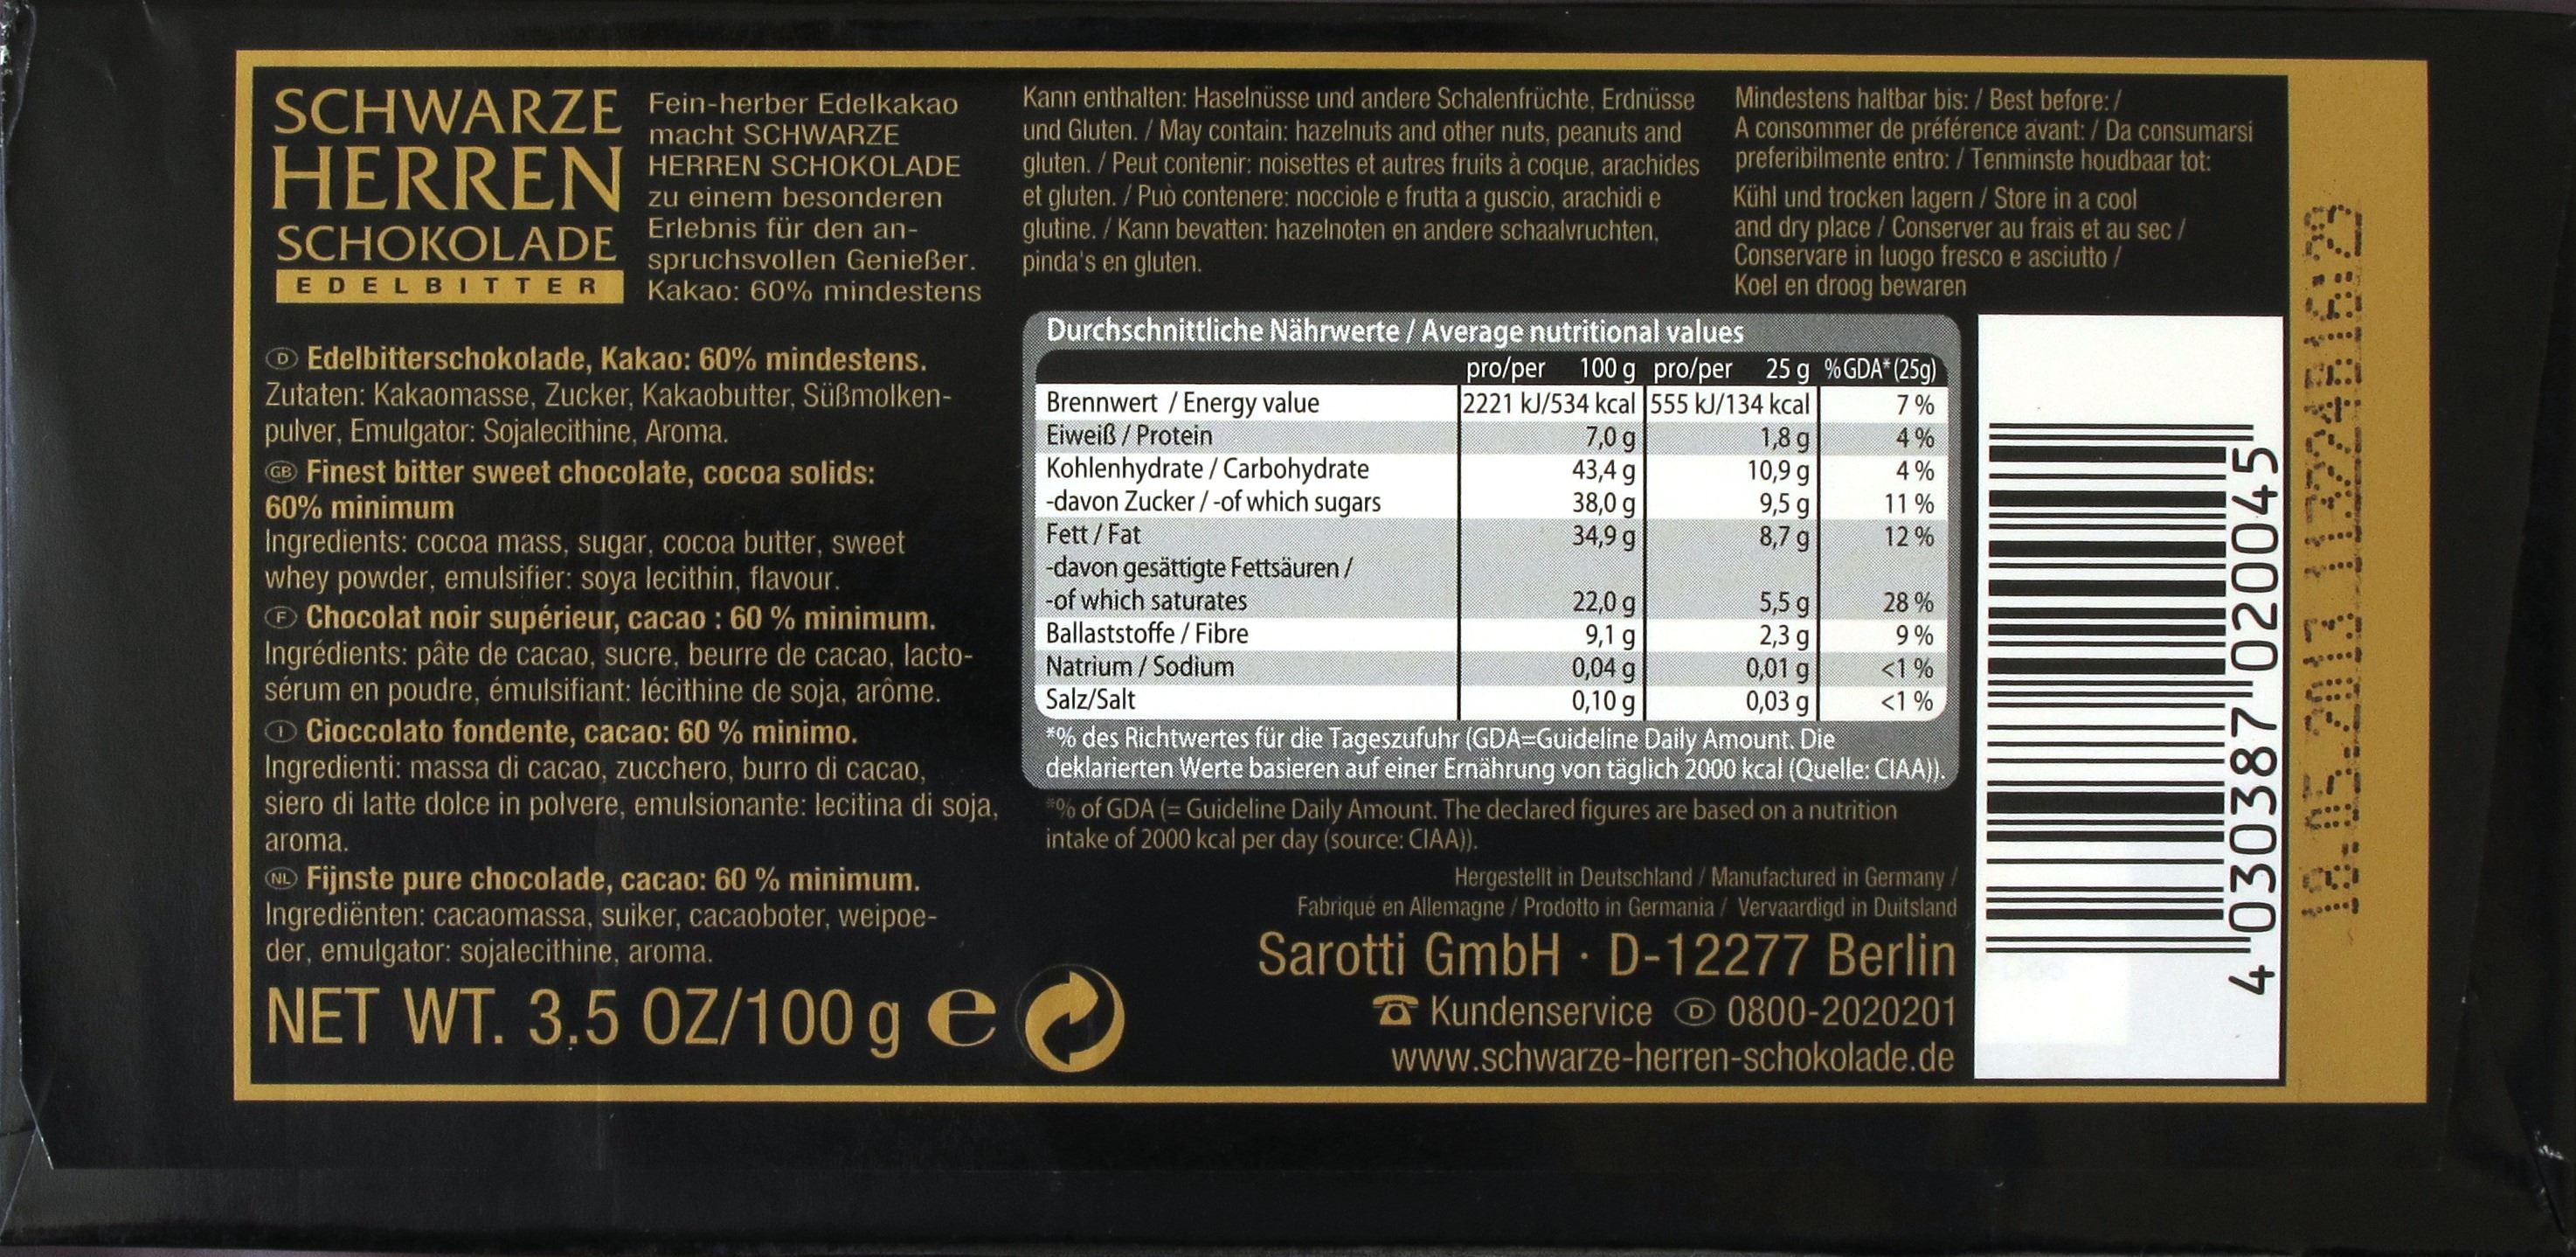 "Sarotti ""Schwarze Herren Schokolade"" - Inhaltsangaben"